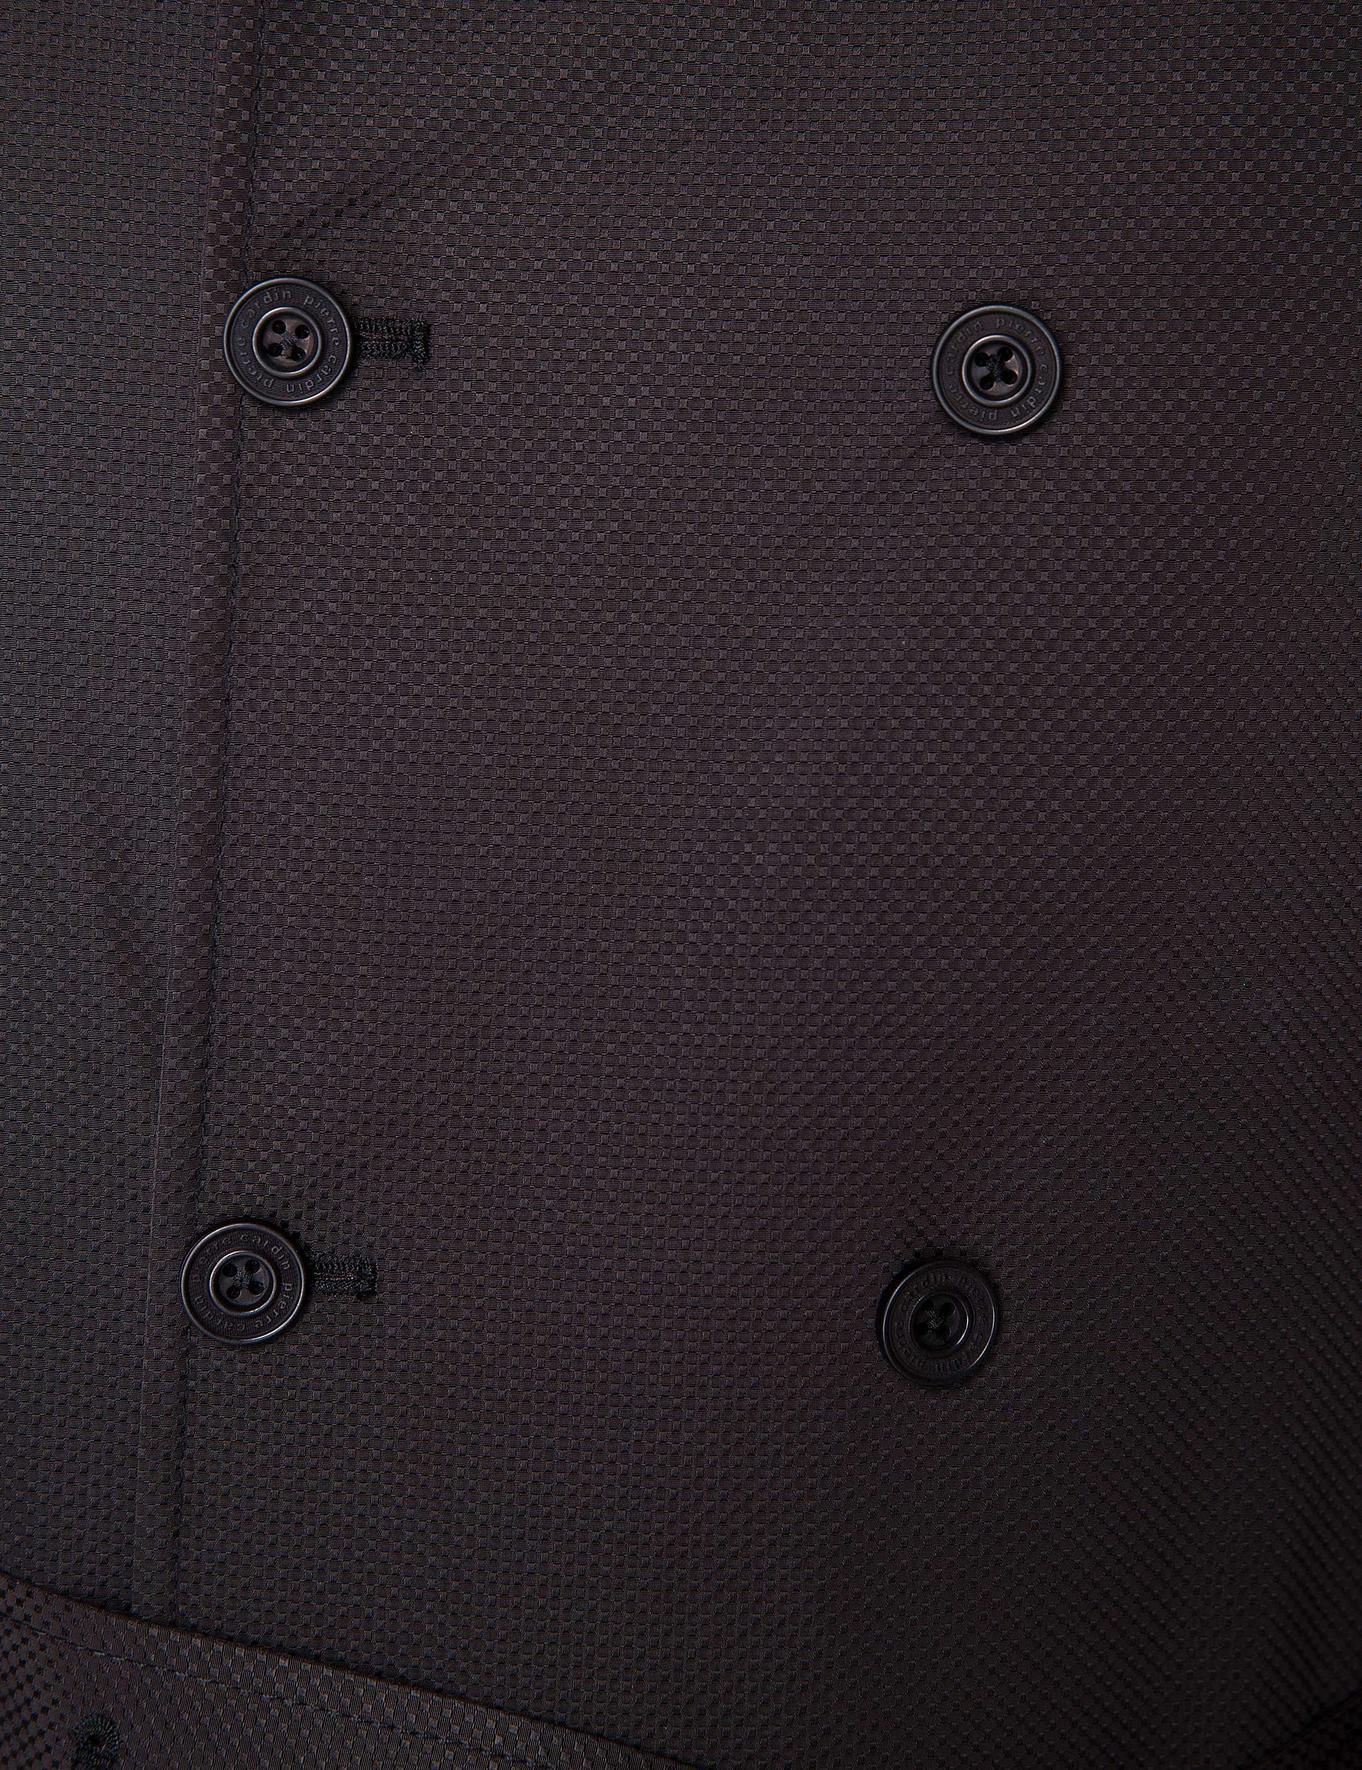 Siyah Trençkot